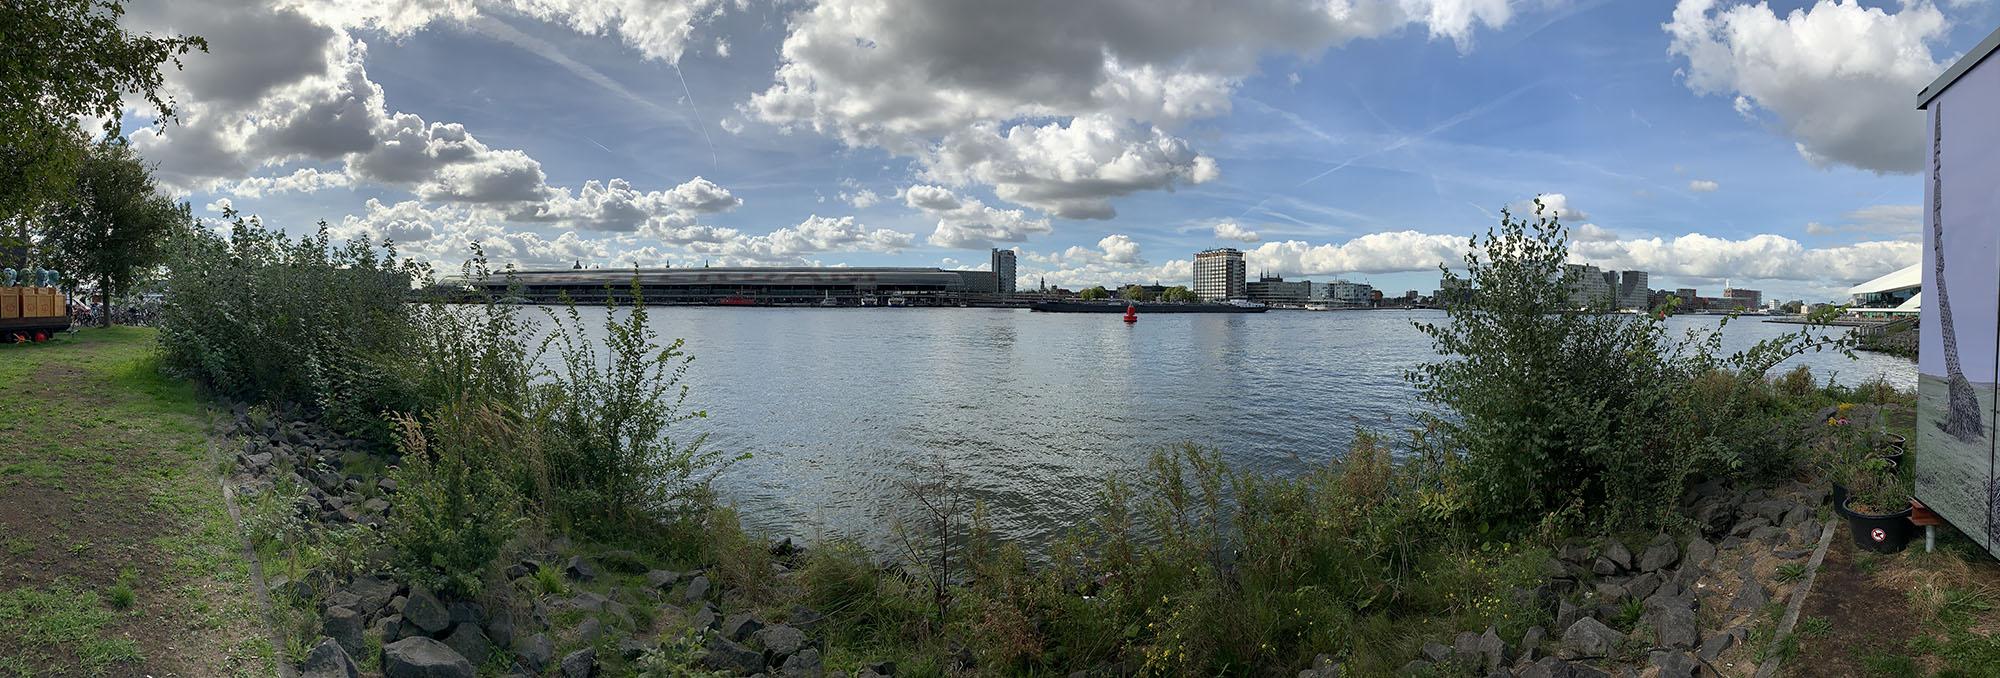 Panorama, foto gemaakt met iPhone 8 Plus